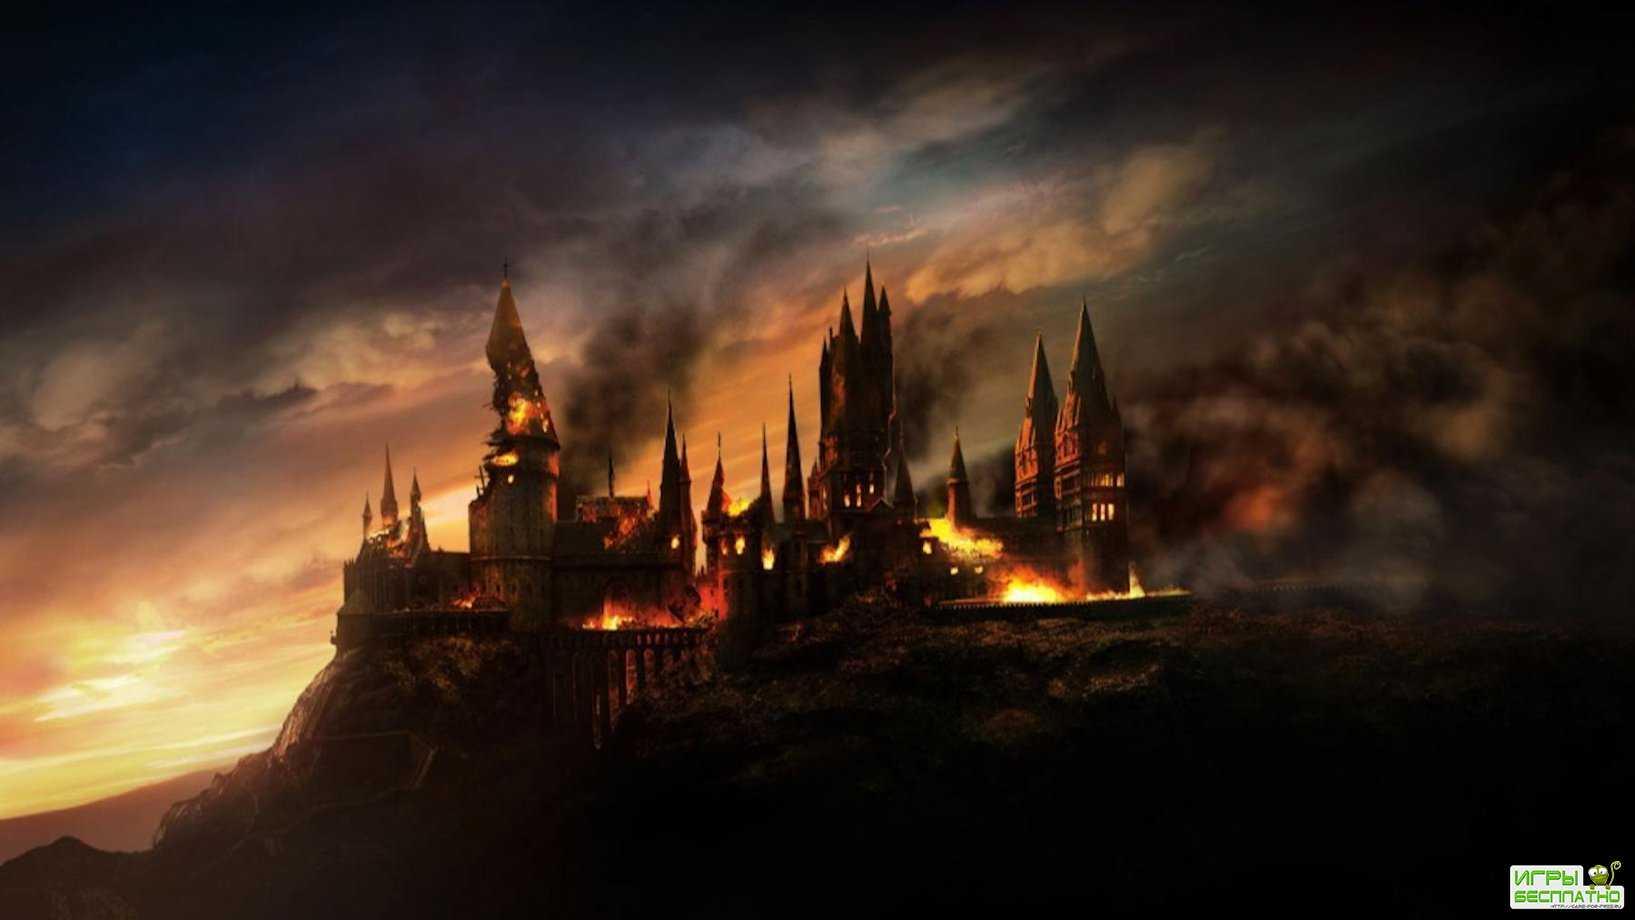 Анонс Hogwarts: A Dark Legacy уже совсем скоро